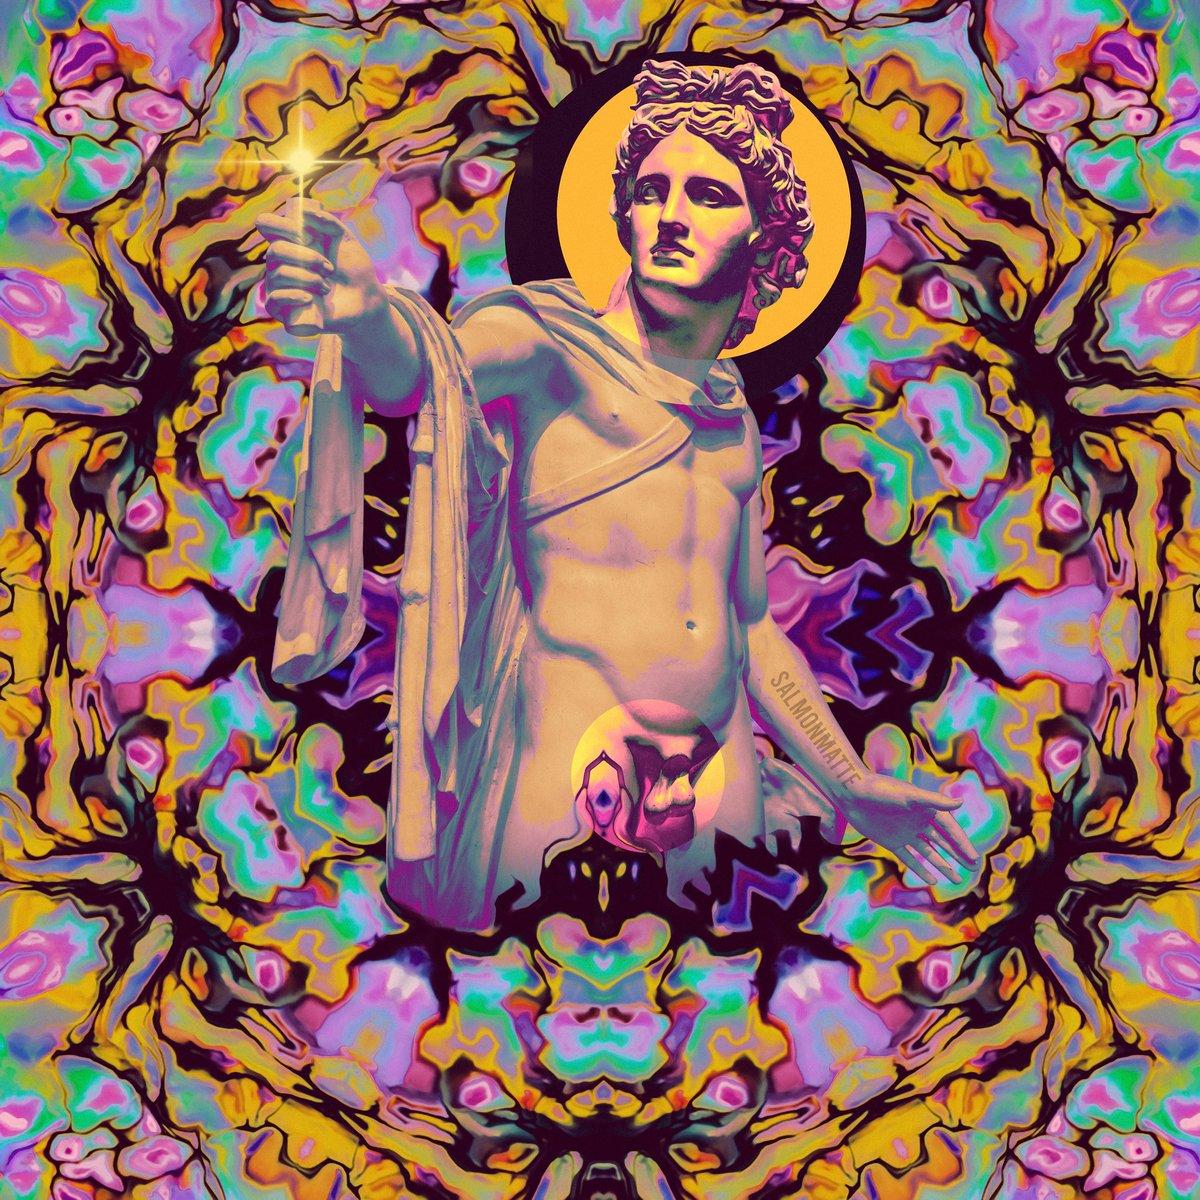 """Starlight(er)"" License this piece for your next creative project via @ArtgrabCo  #albumart #kaleidoscope #trippyart pic.twitter.com/2ejT8RcGLQ"